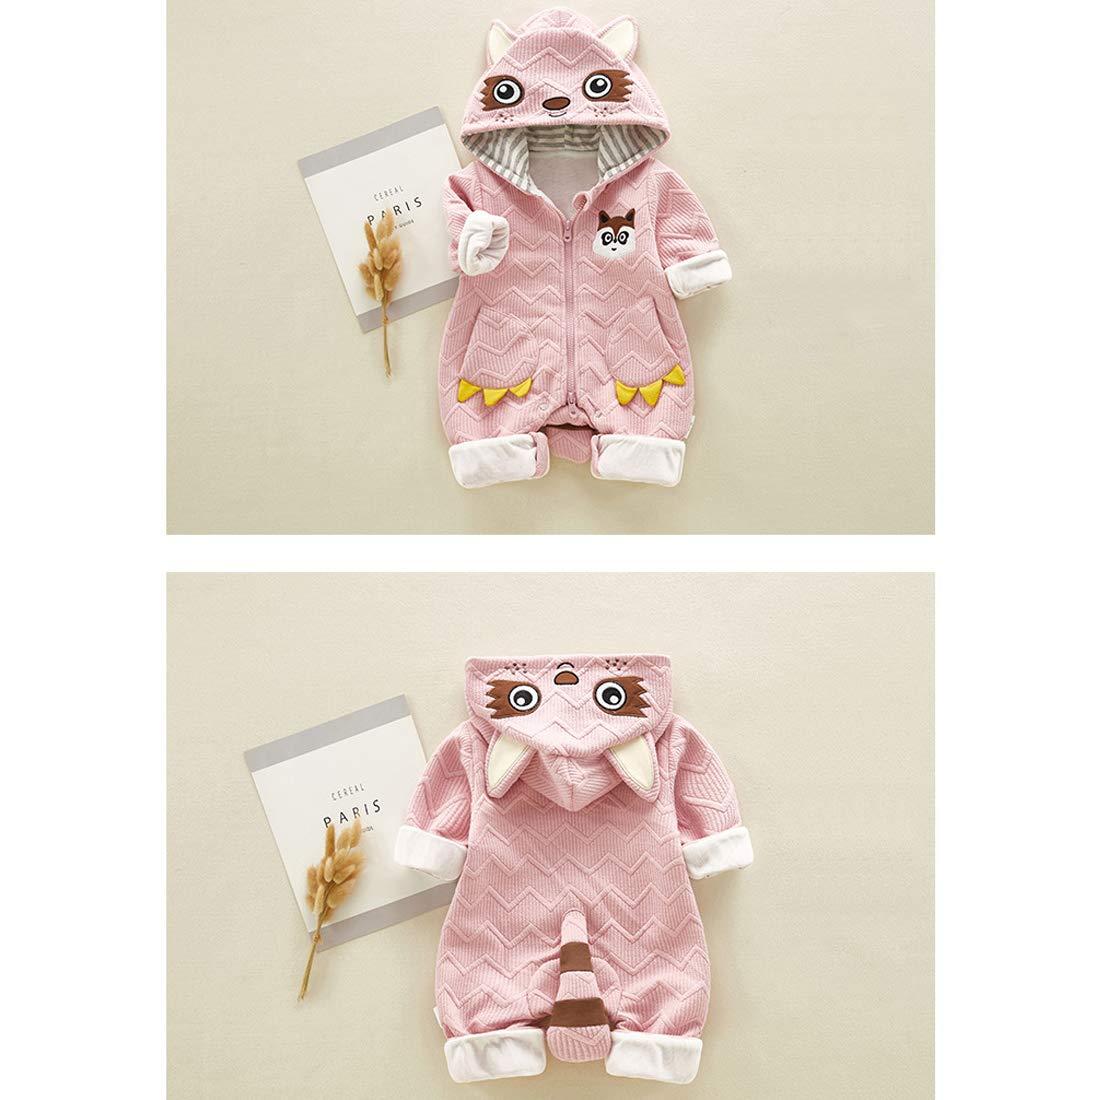 DorkasDE Baby Strampler Neugeborene Kleinkinder Strampleranzug Overall Cartoon Jumpsuit Fr/ühling Herbst Babykleidung mit Kapuze